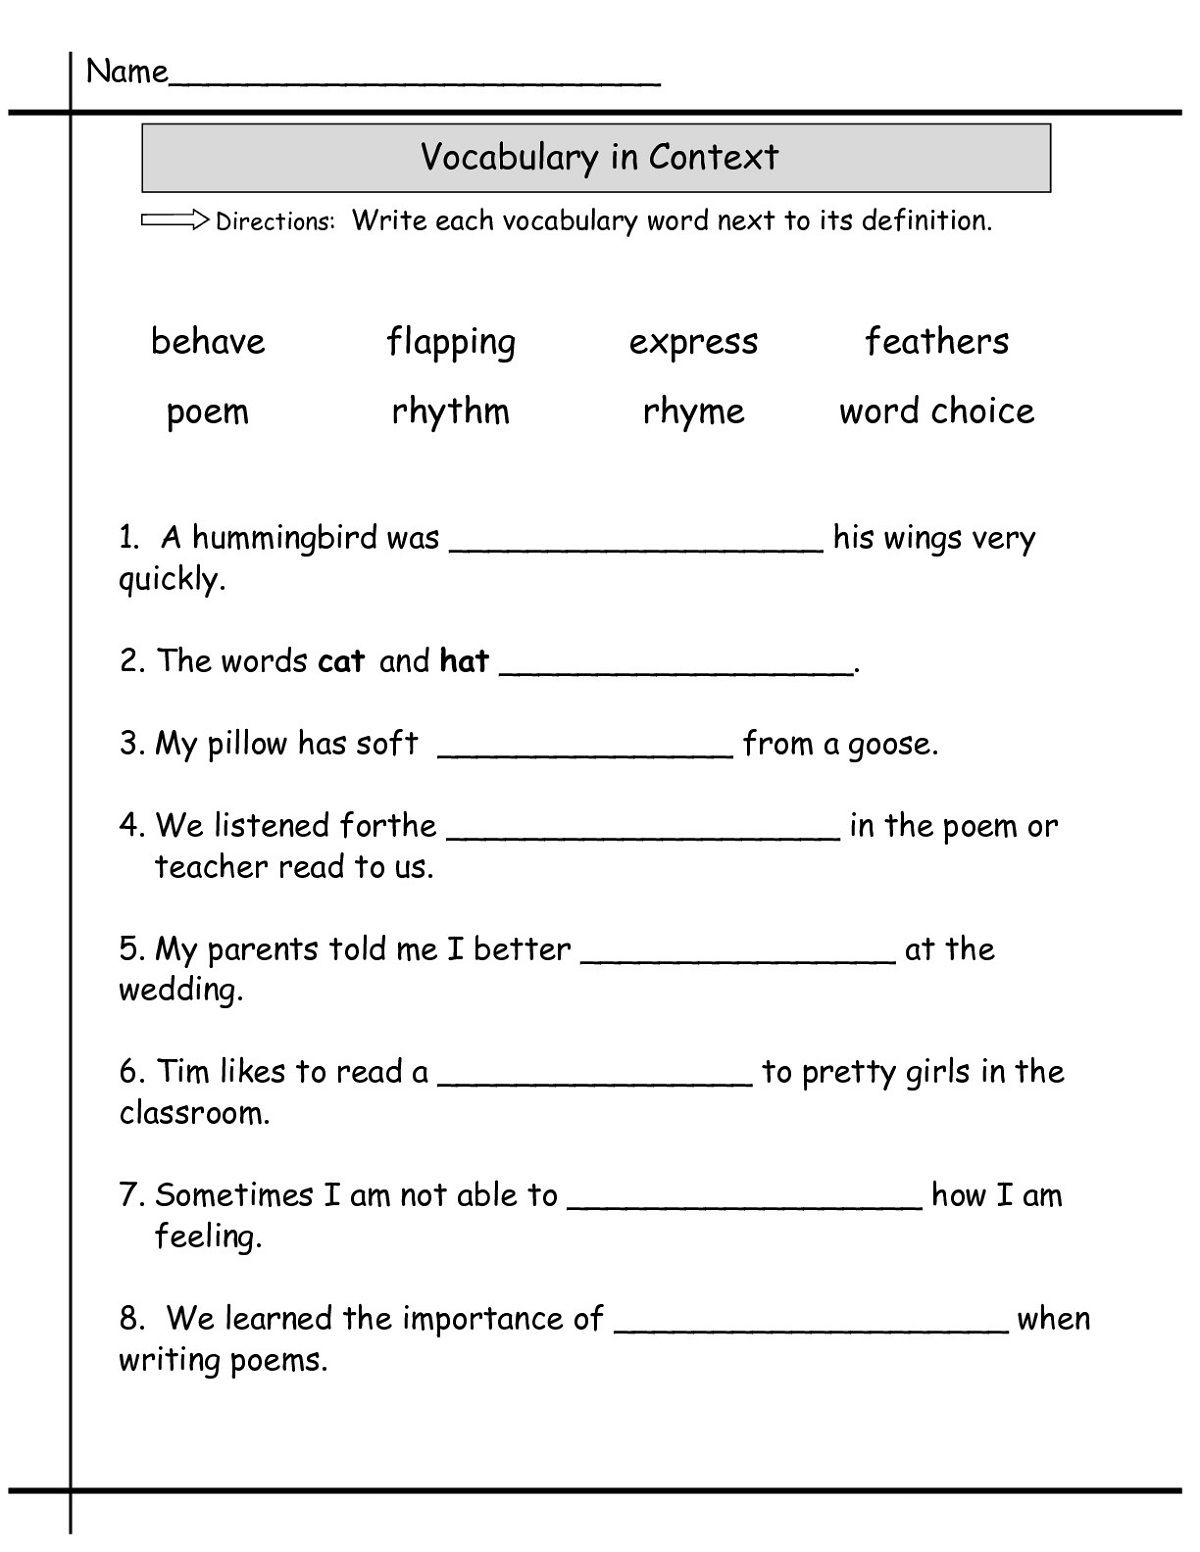 hight resolution of https://dubaikhalifas.com/free-english-grammar-worksheet-for-class-2-finest-worksheet/